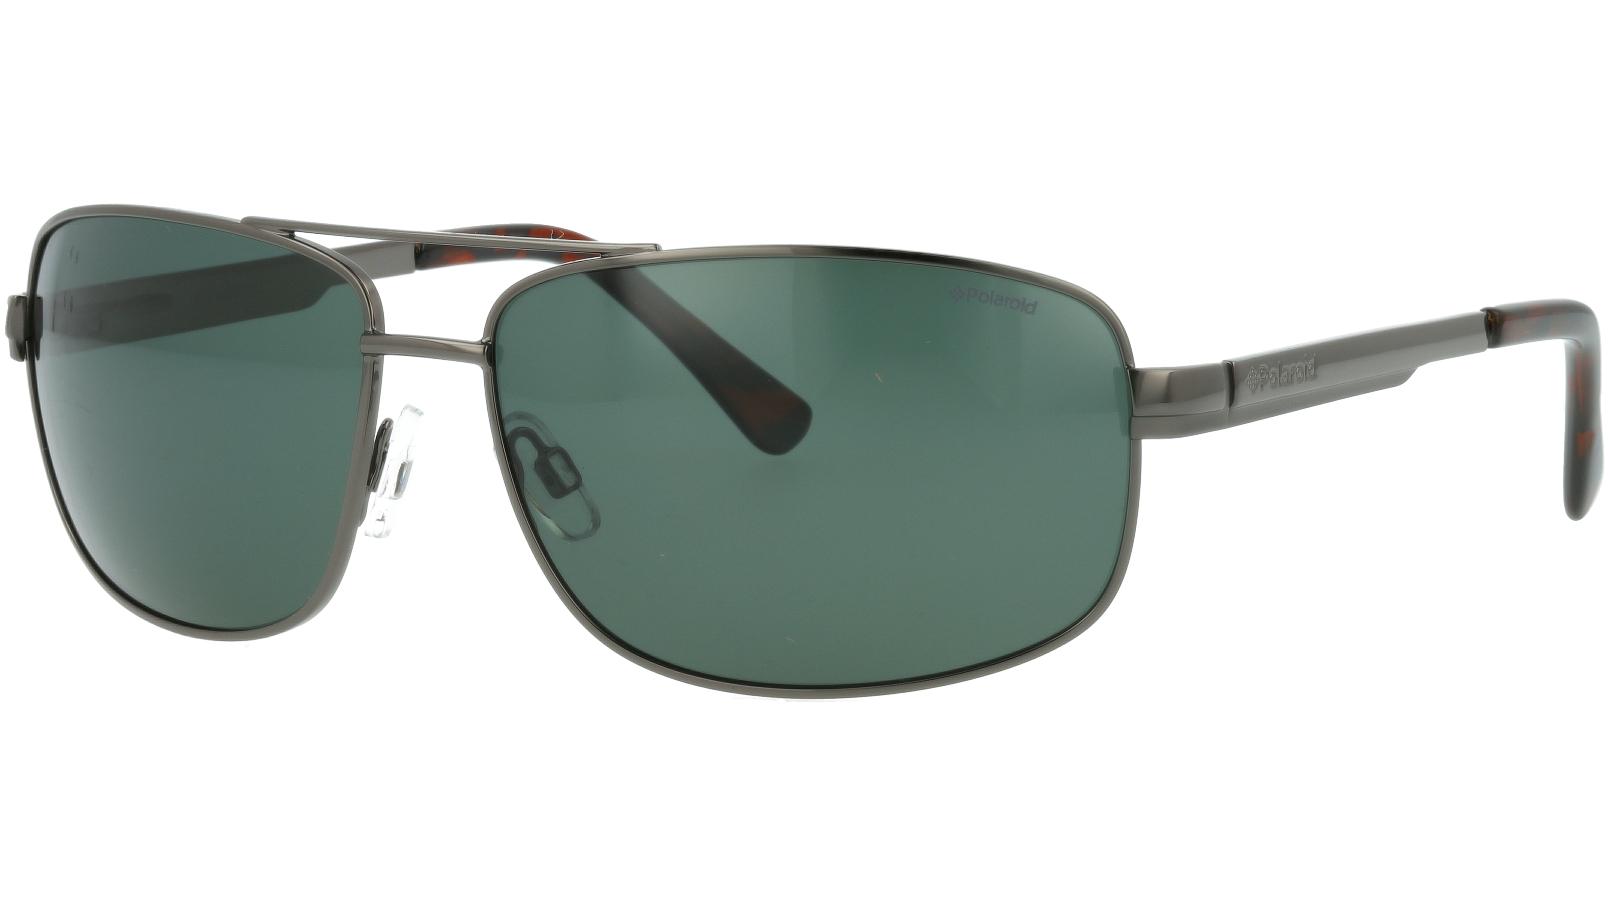 Polaroid P4314 KIHRC 63 BLACK Sunglasses